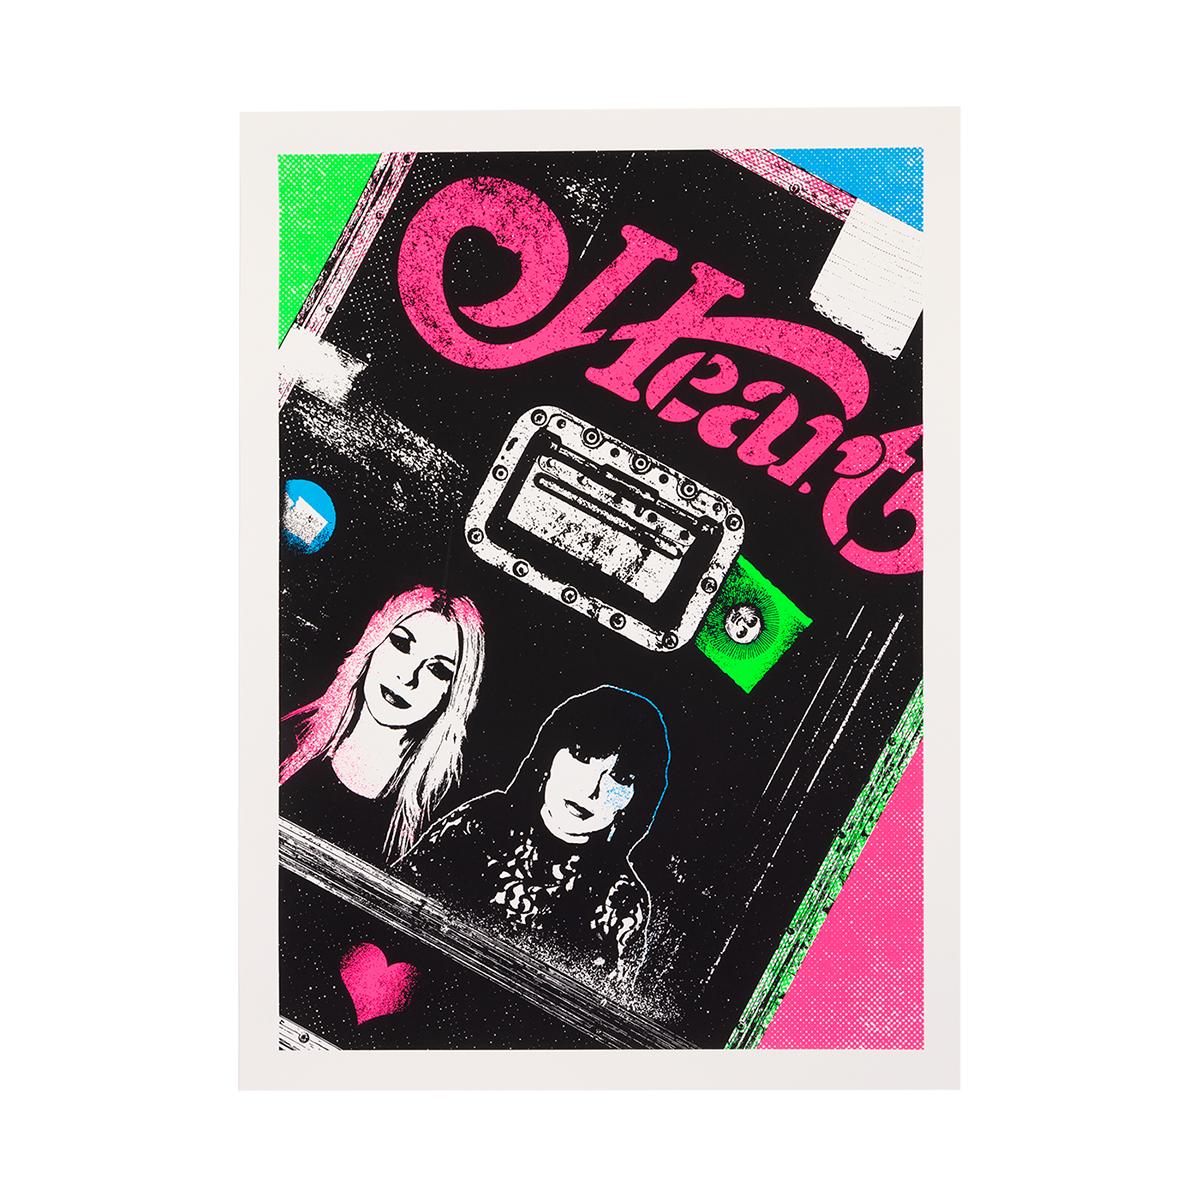 Gig Case Poster